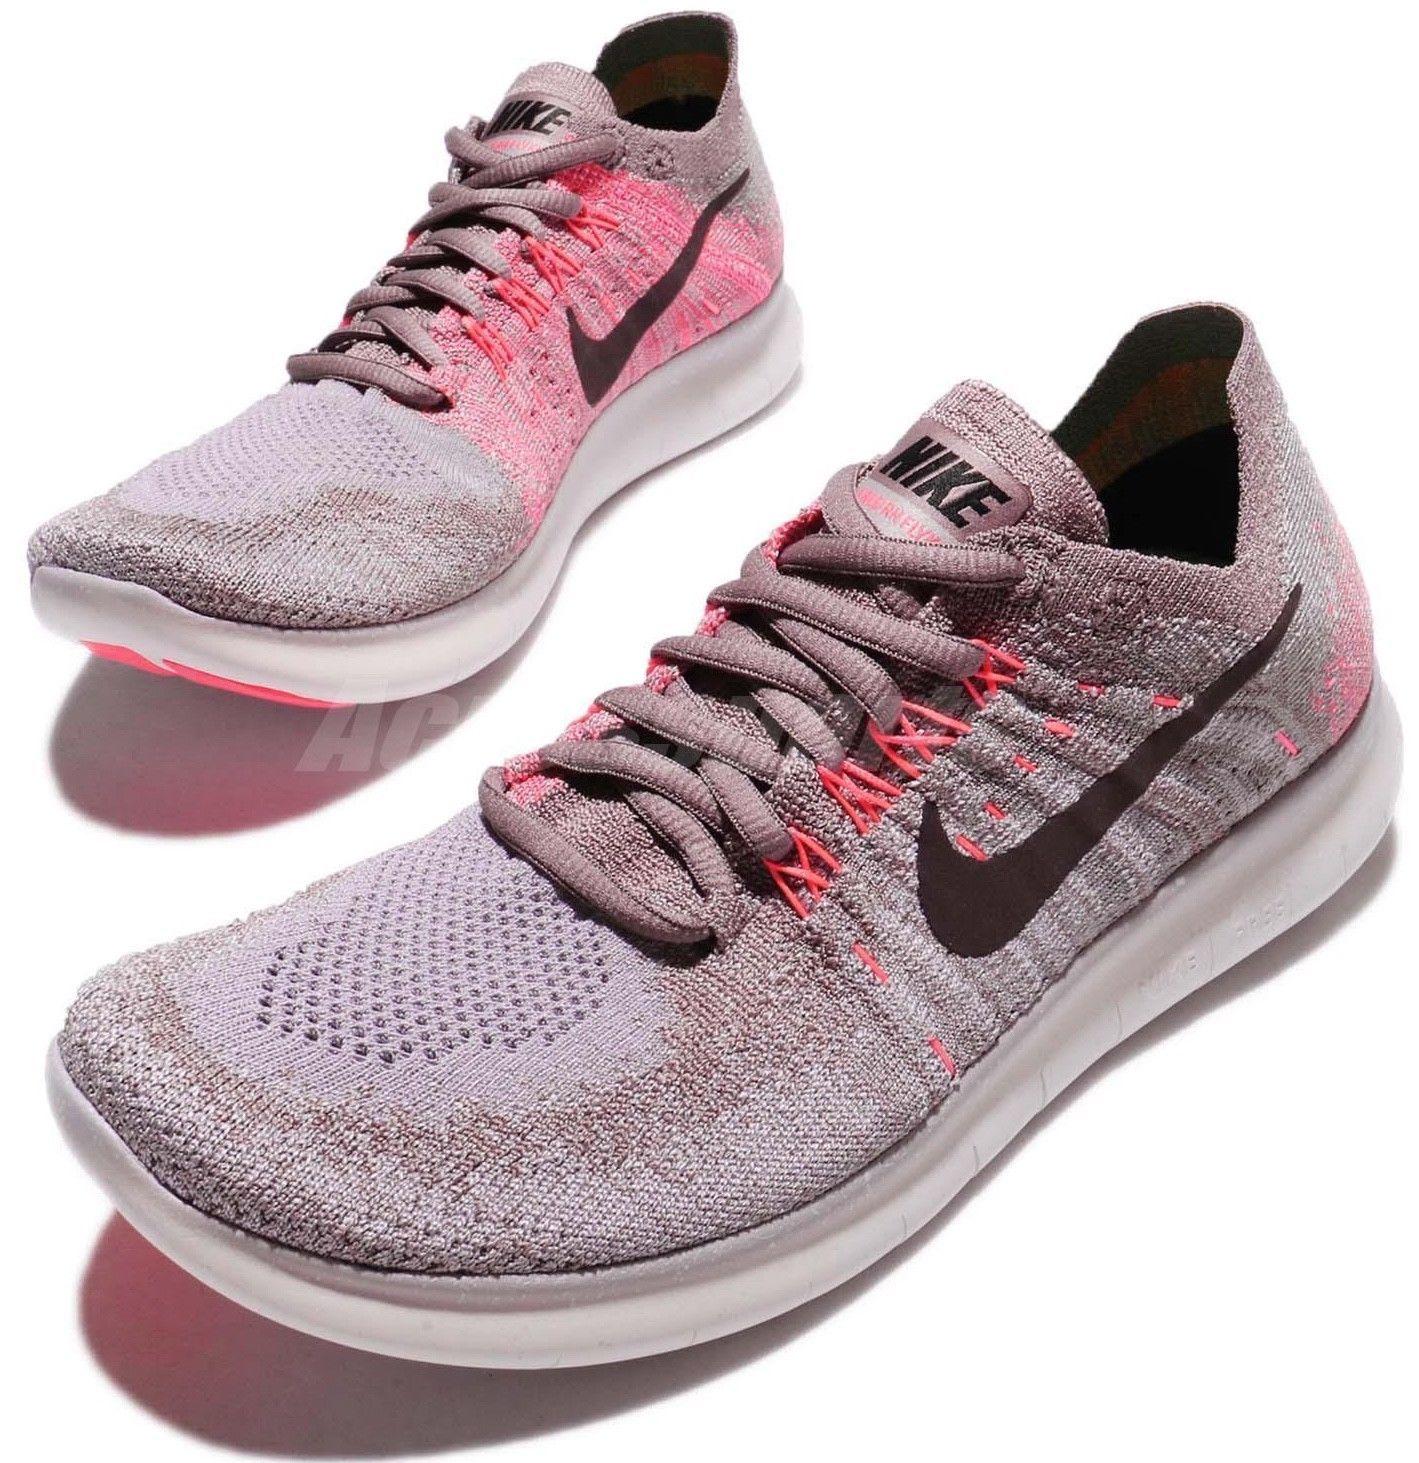 b7c0ddf77de2c New Nike Free Rn Flyknit 2017 Wmn Us Sz: 6.5 and 23 similar items